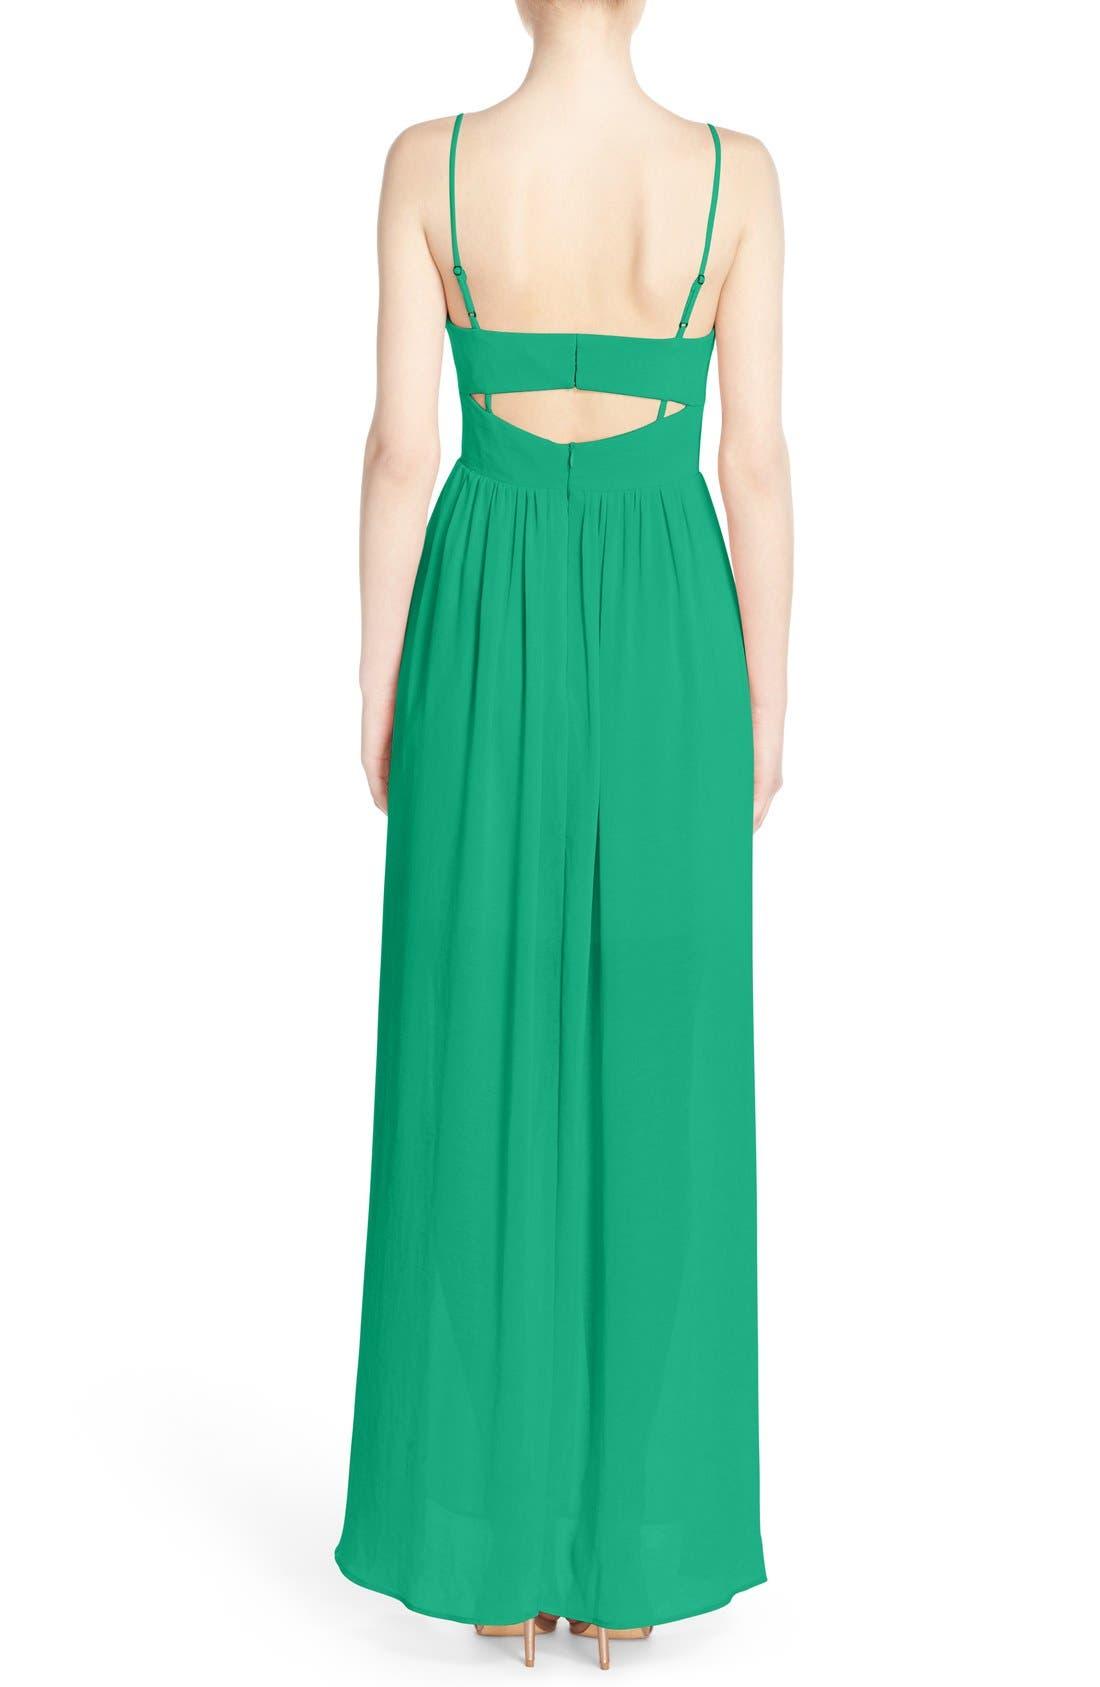 ADELYN RAE, Cutout Back Chiffon Maxi Dress, Alternate thumbnail 2, color, 340